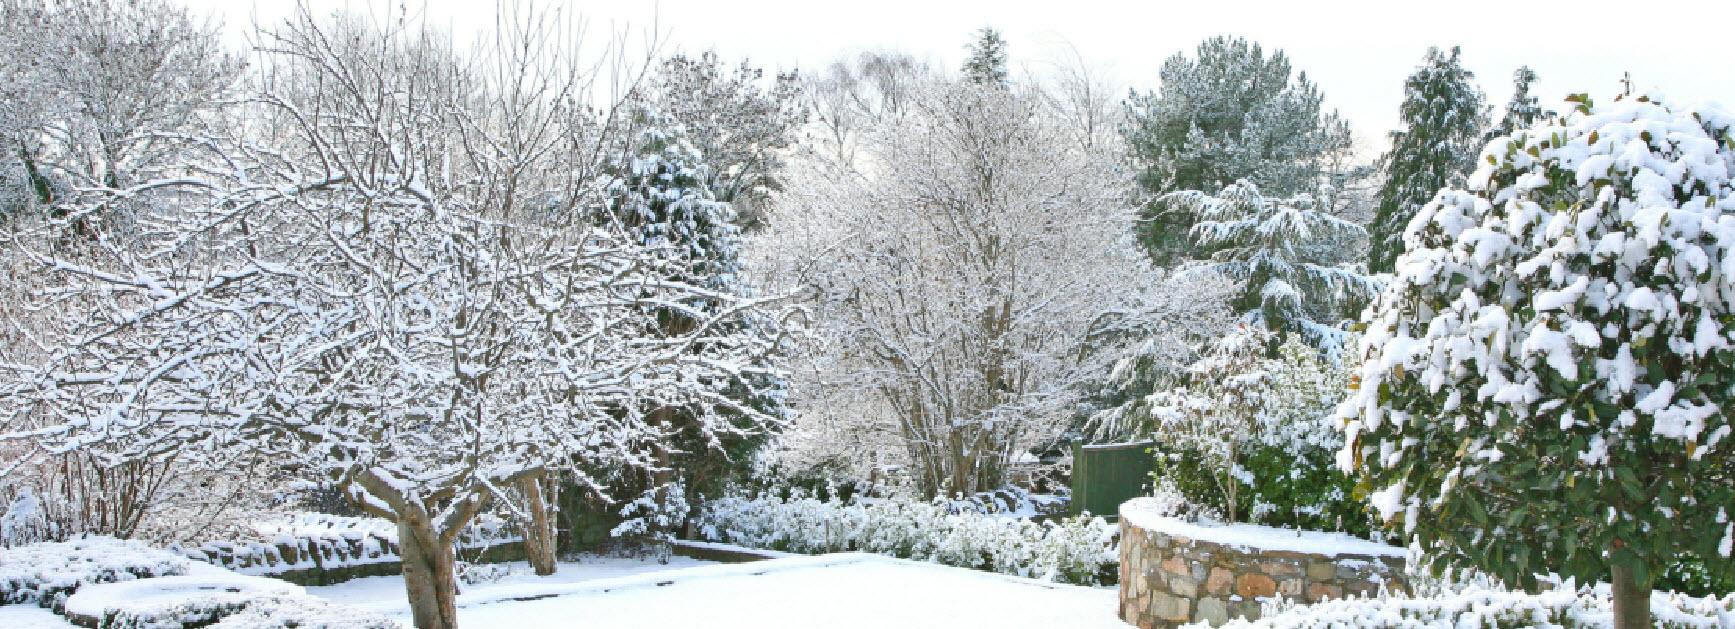 Milorganite blog green and growing naturally for Winter garden maintenance